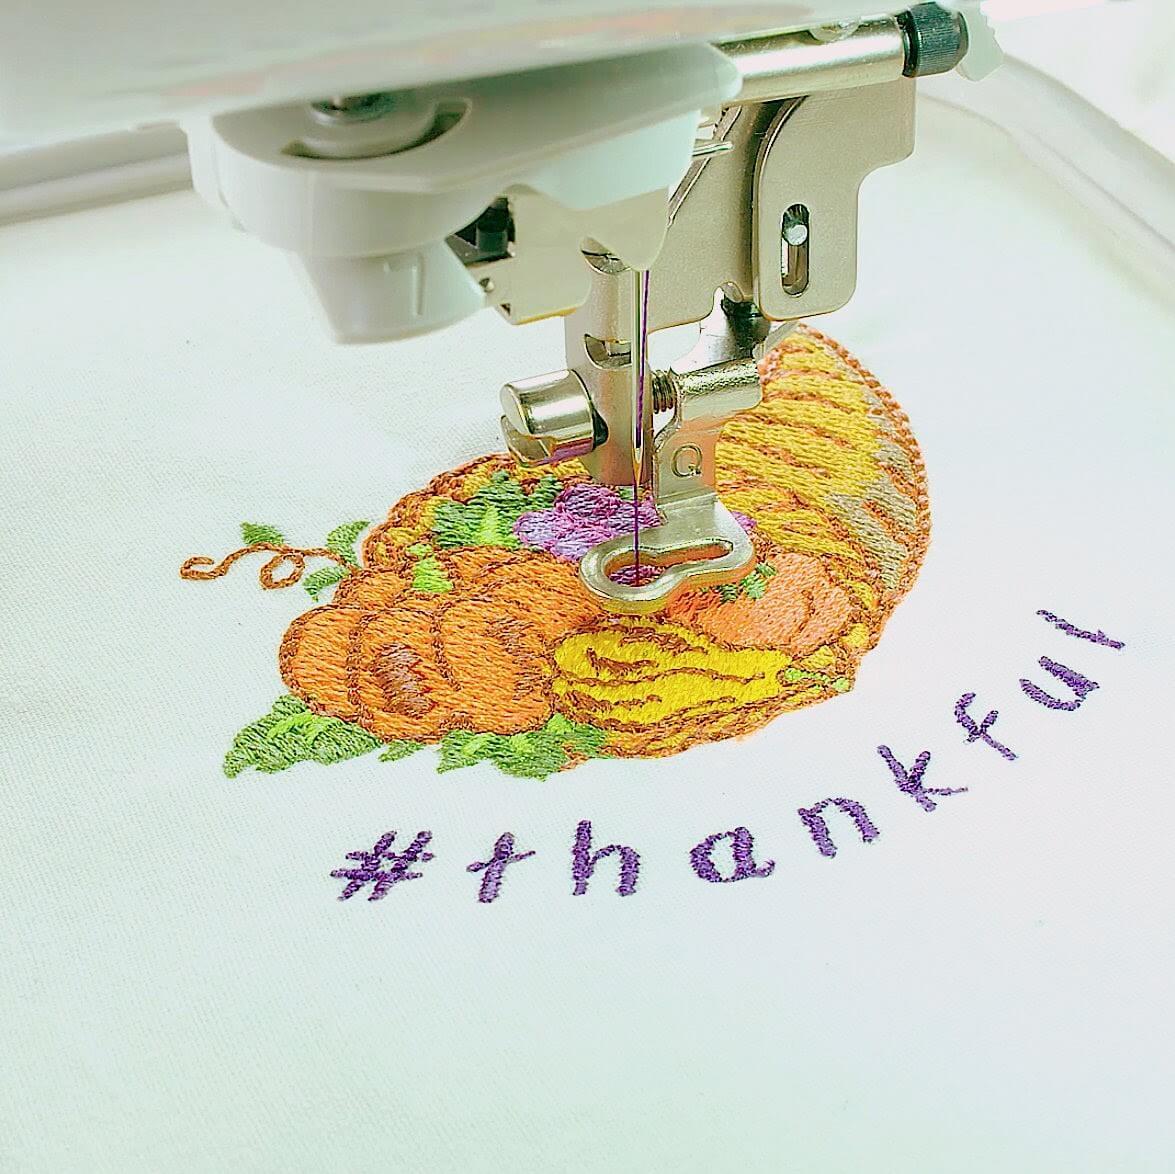 pe535 embroidery machine